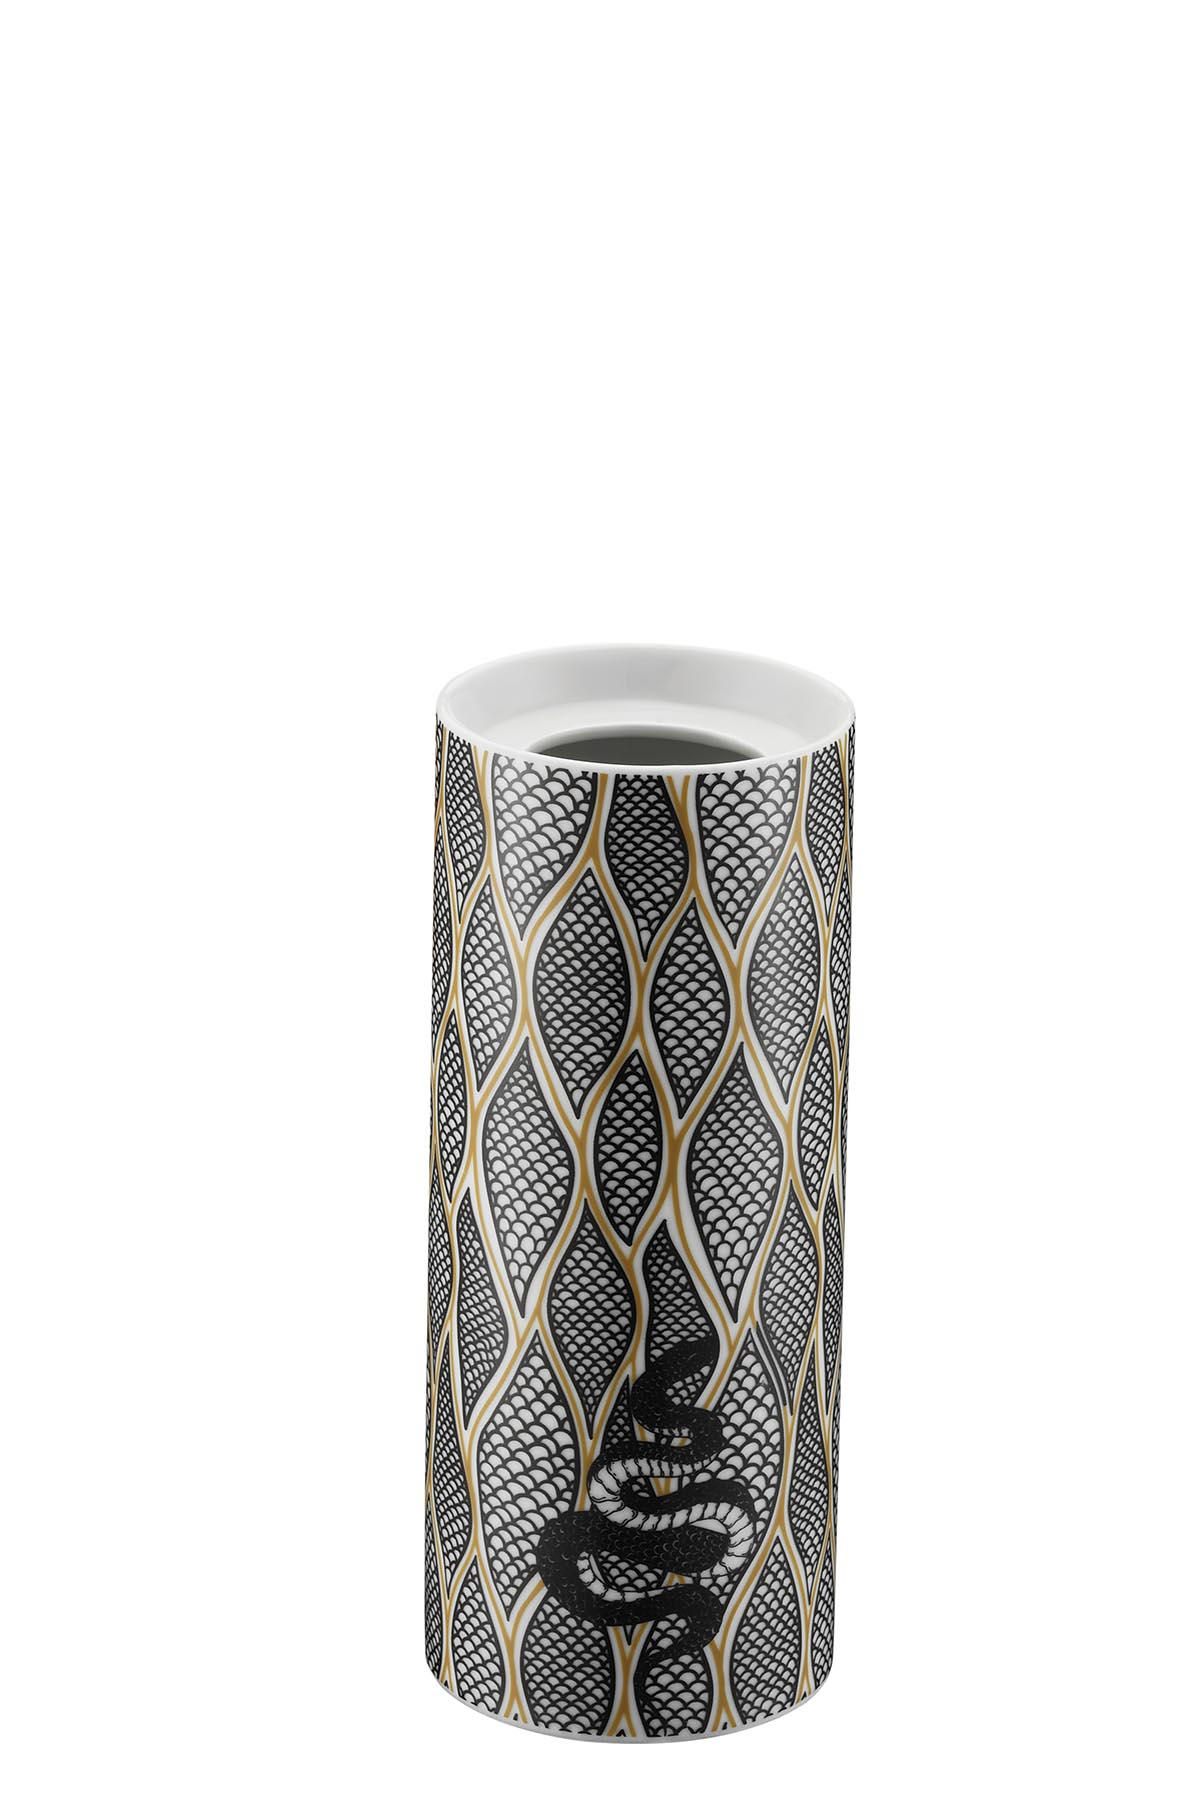 Kütahya Porselen Modern 2 Parça Vazo Takımı 10919